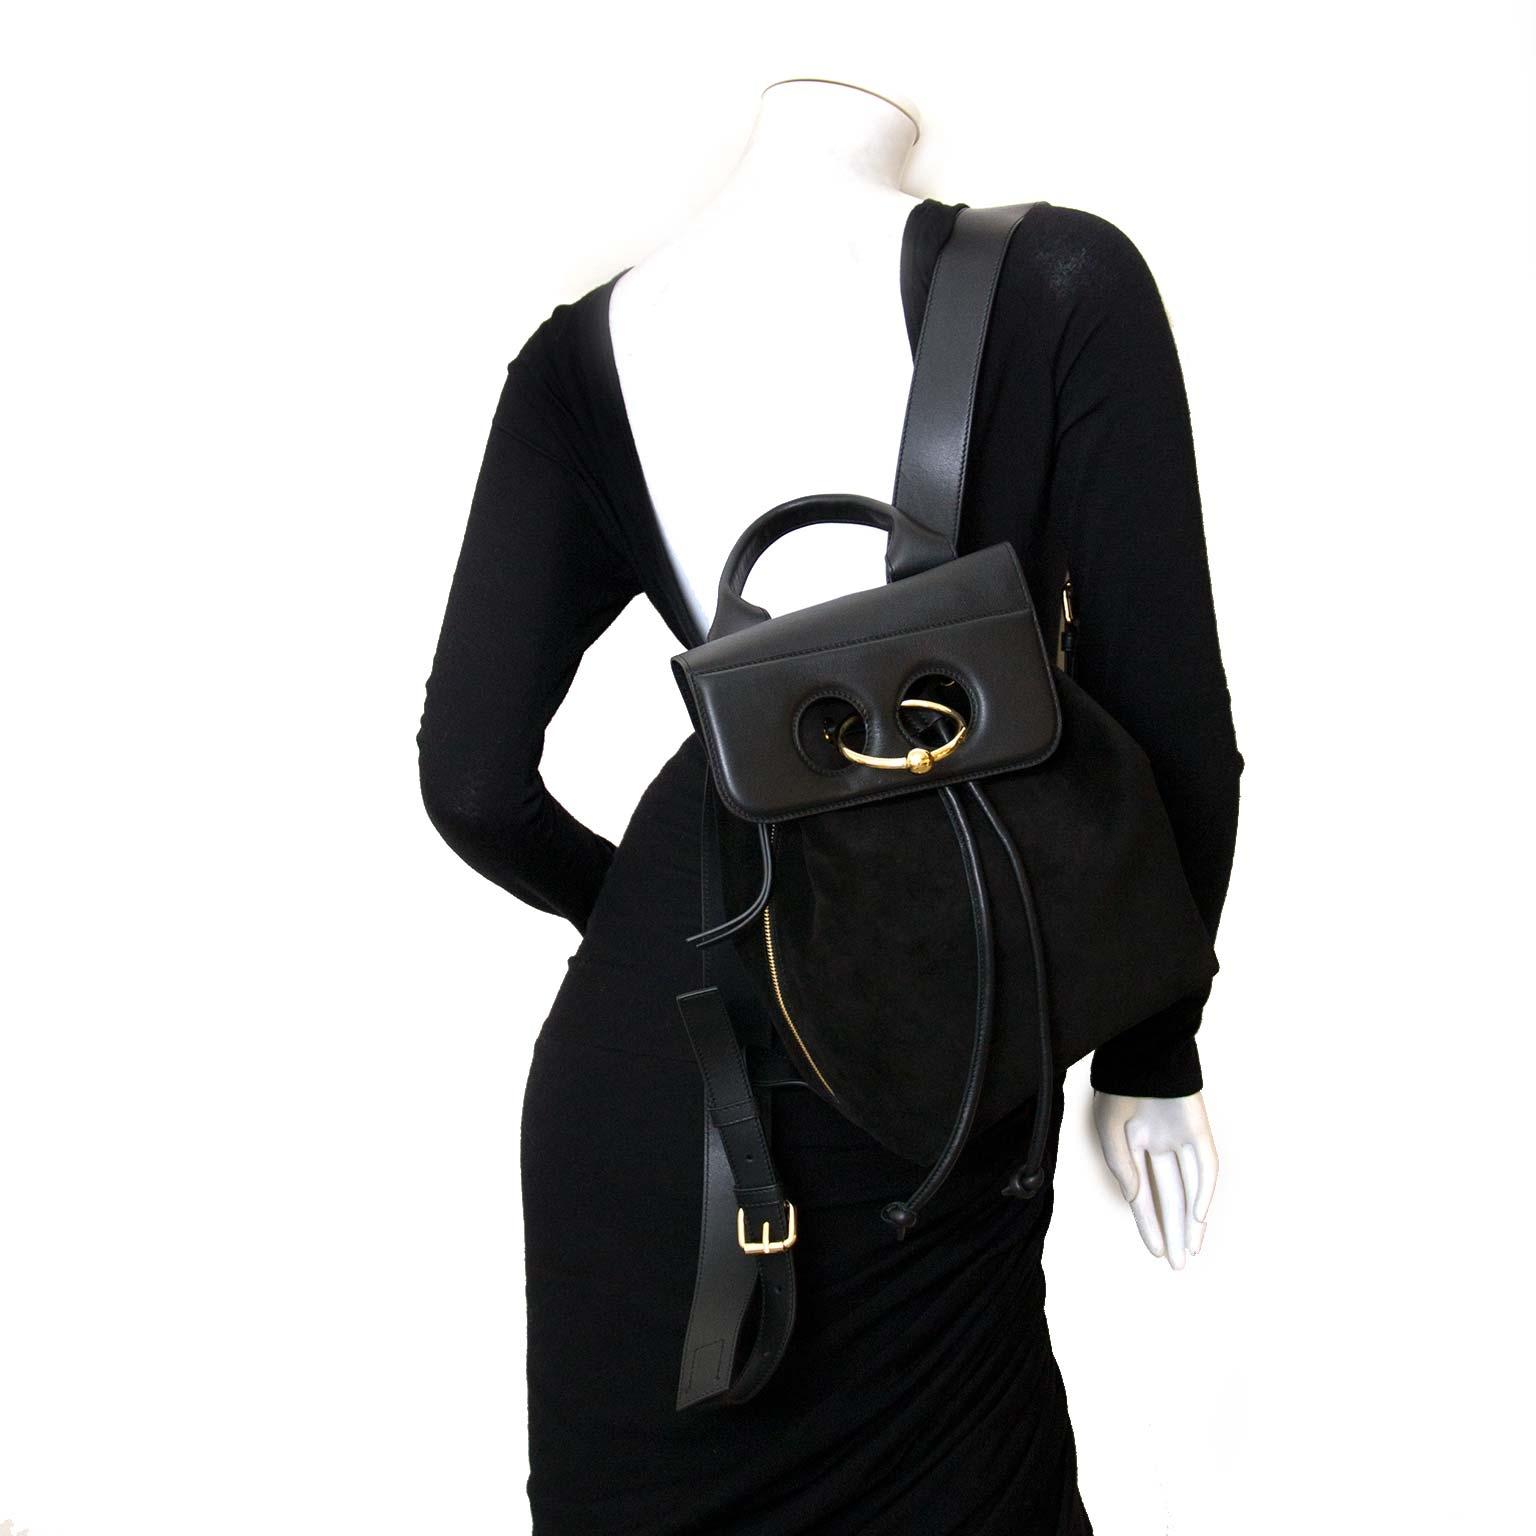 jw anderson mini pierce rugzak zwart te koop bij labellov vintage mode webshop belgië